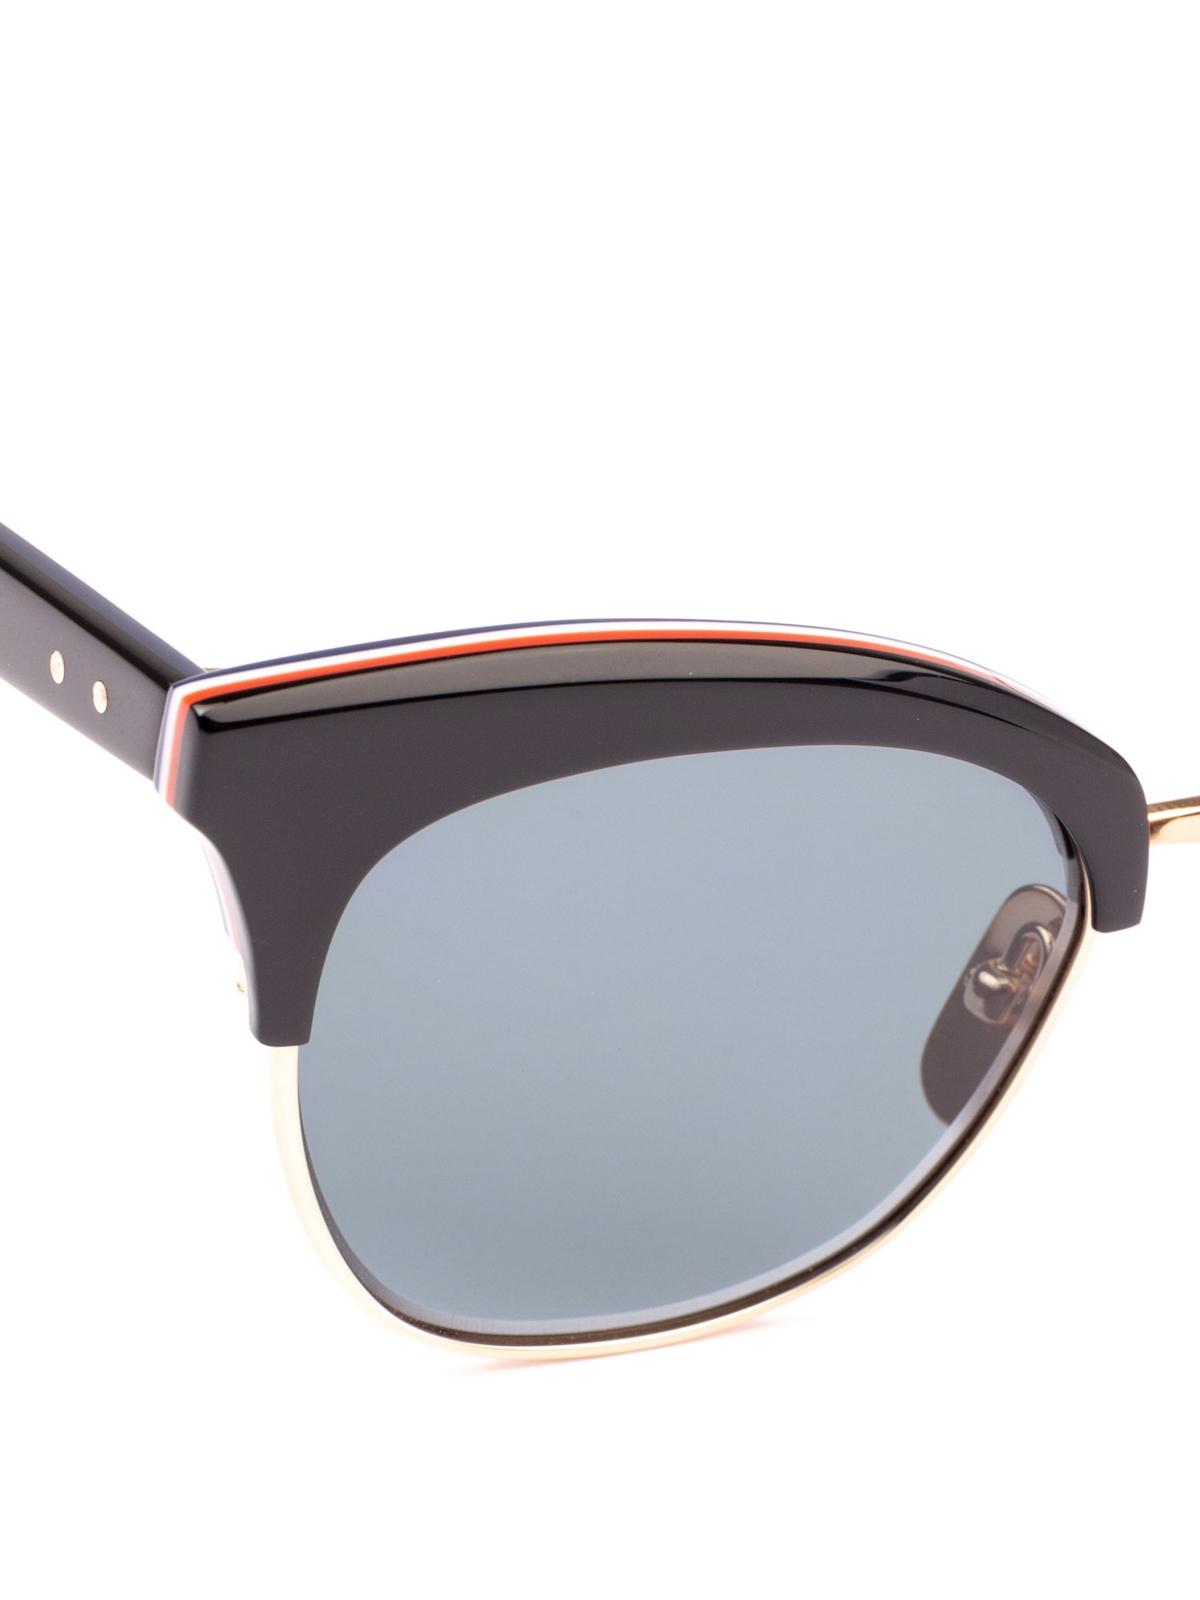 8435b2b9b99 iKRIX THOM BROWNE  sunglasses - 12K gold laminated lens rim sunglasses